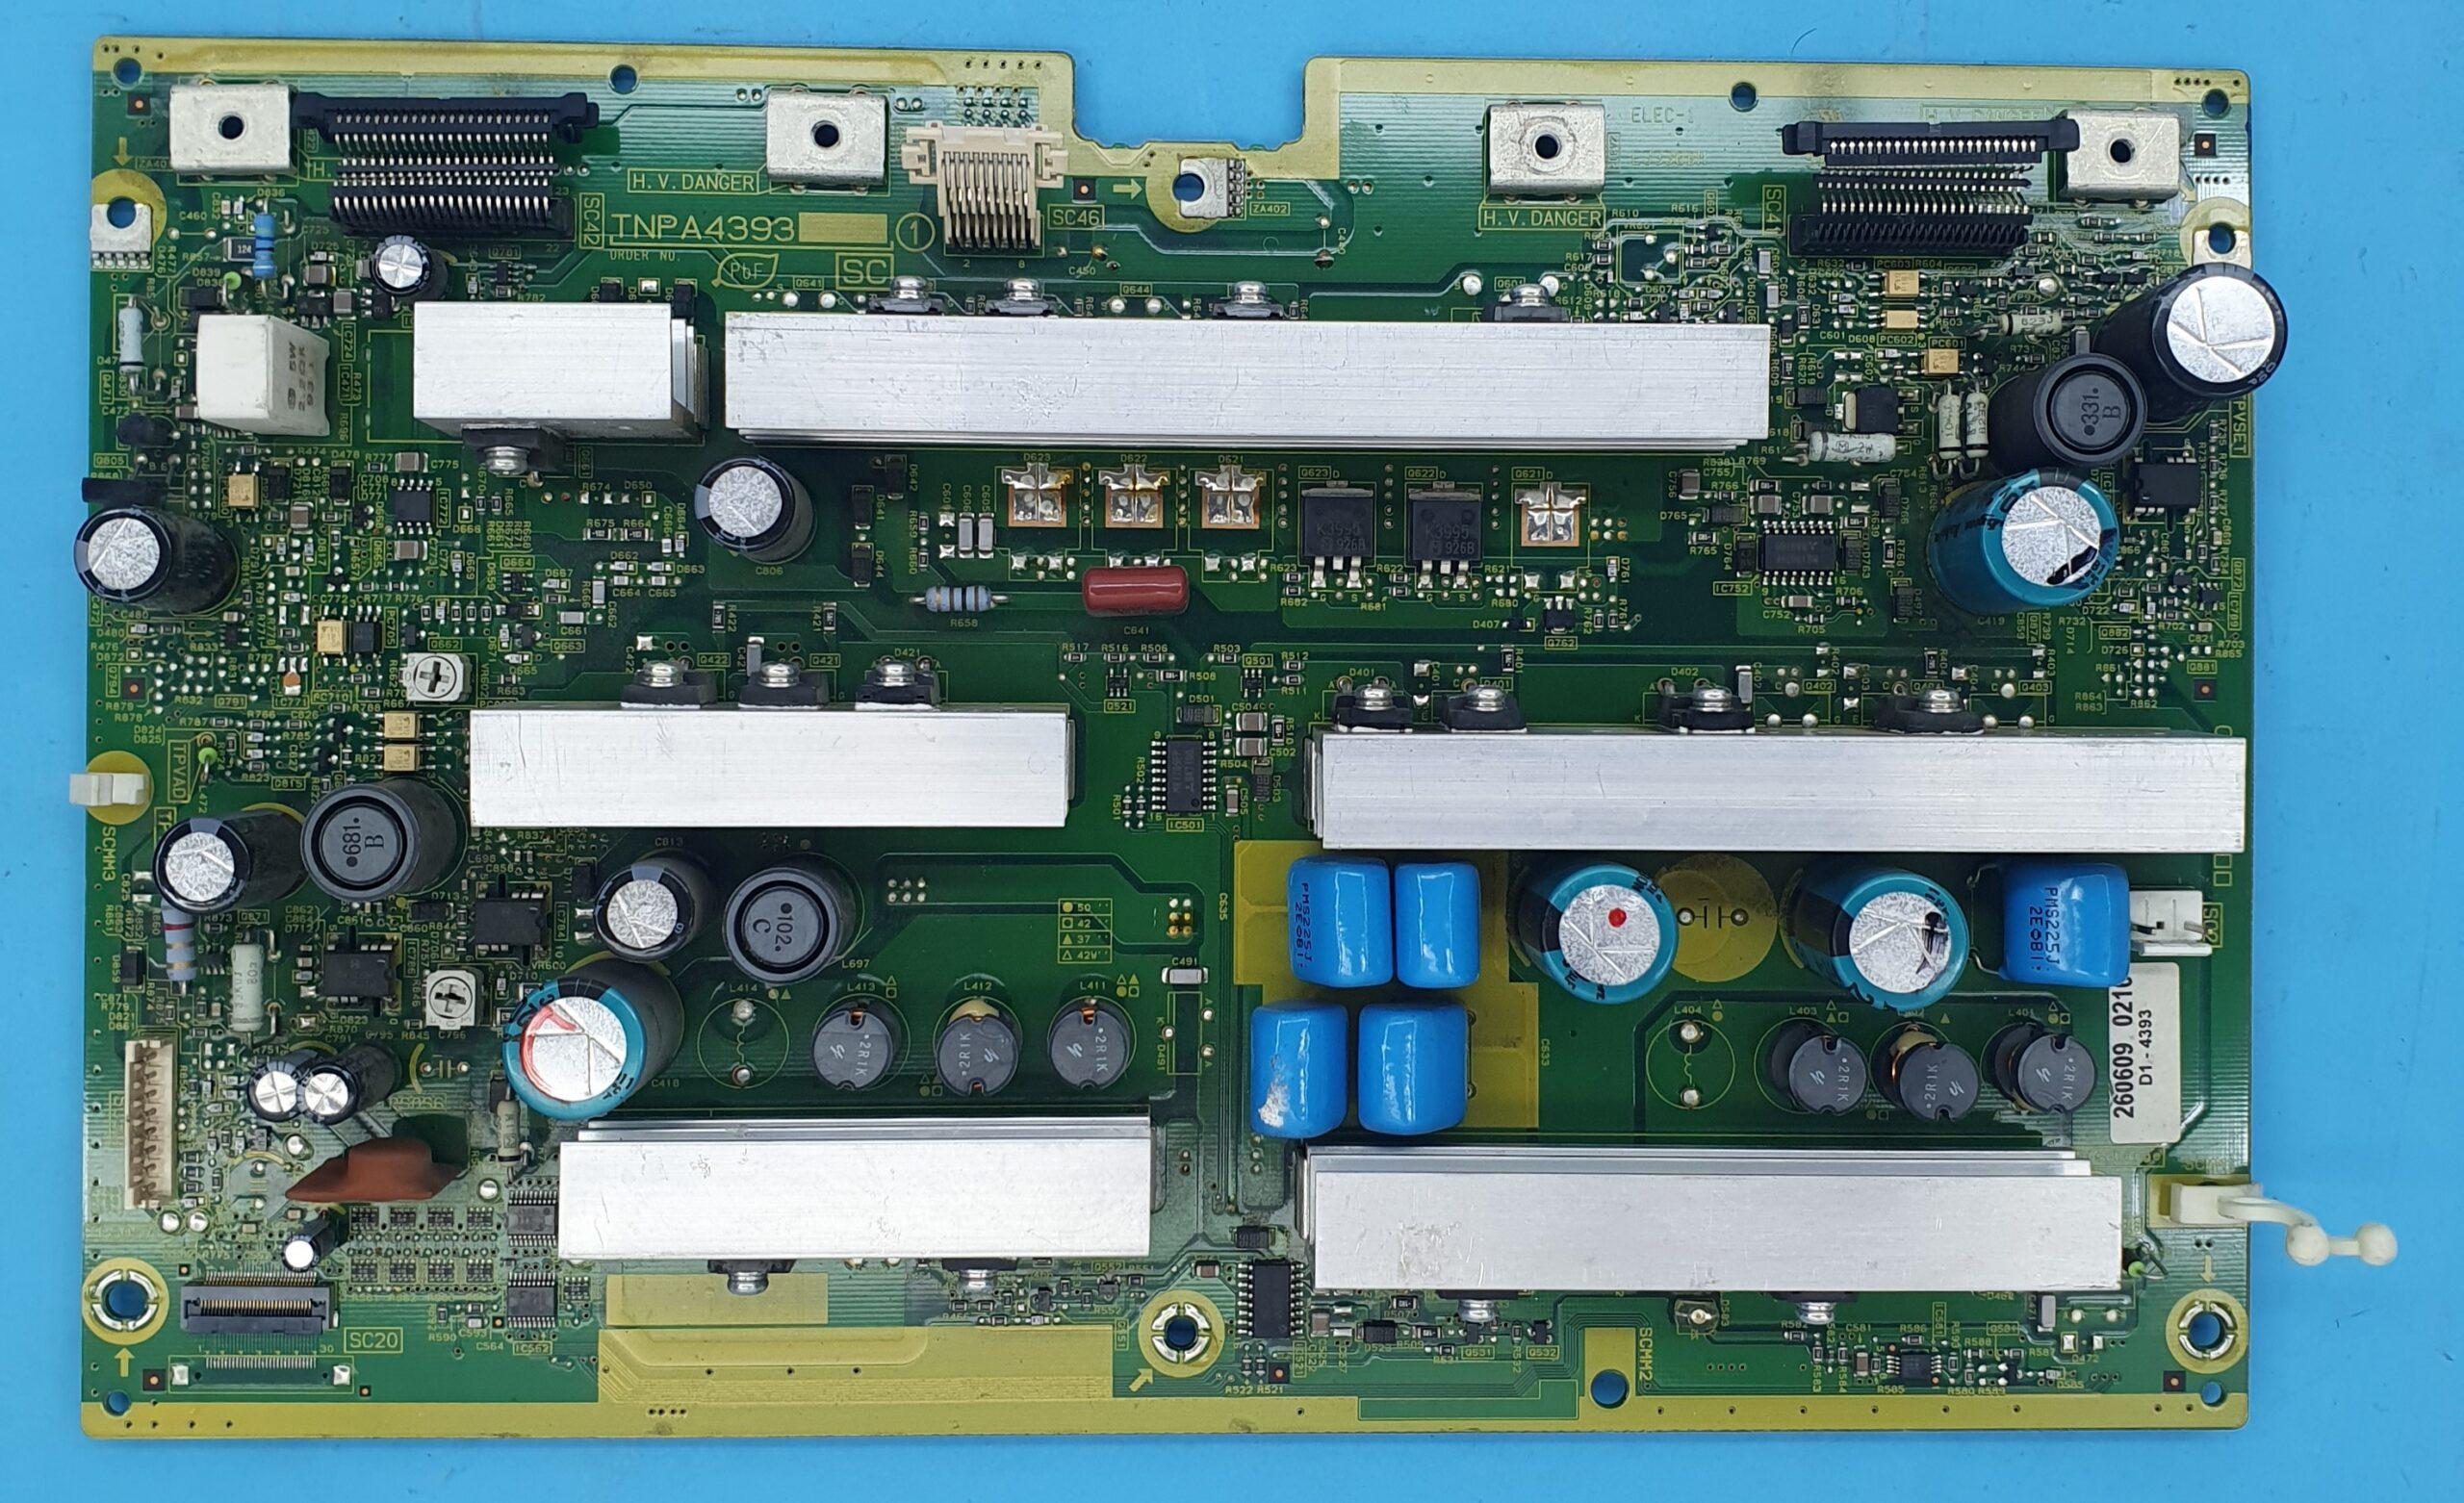 TNPA4393 Panasonic Z-SUS (KDV DAHİL = 130 TL)